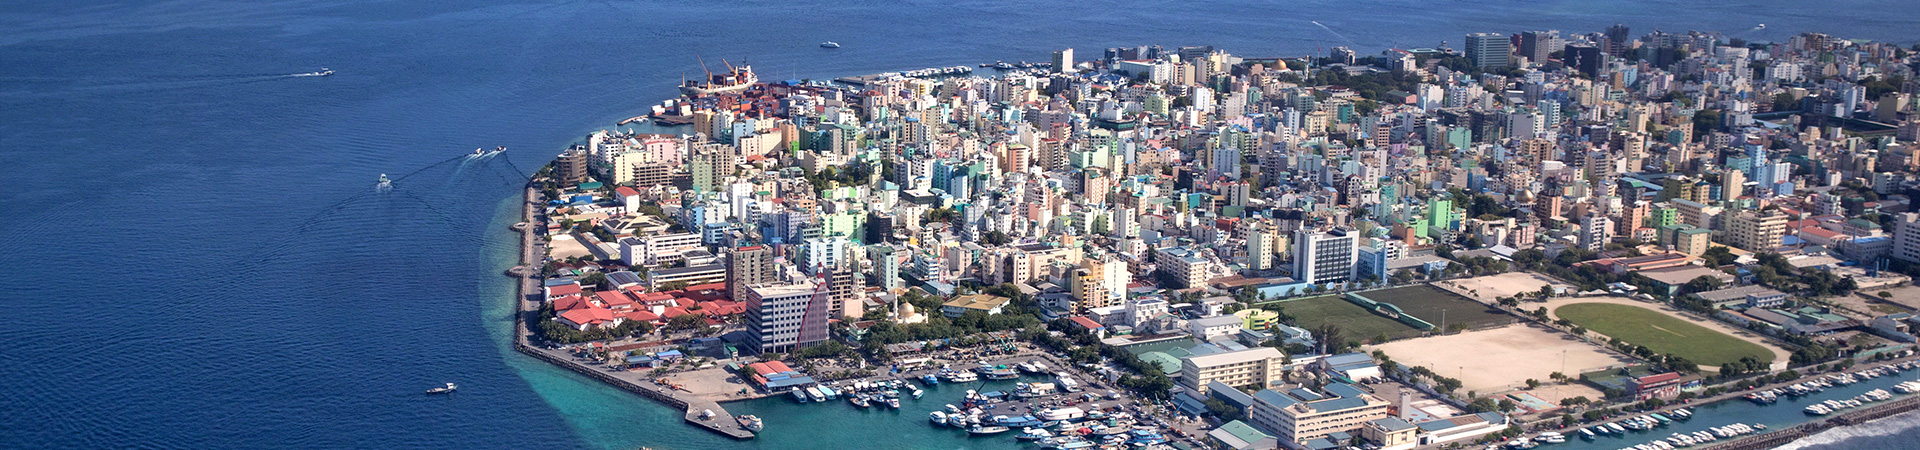 Malediven Hauptstadt Male